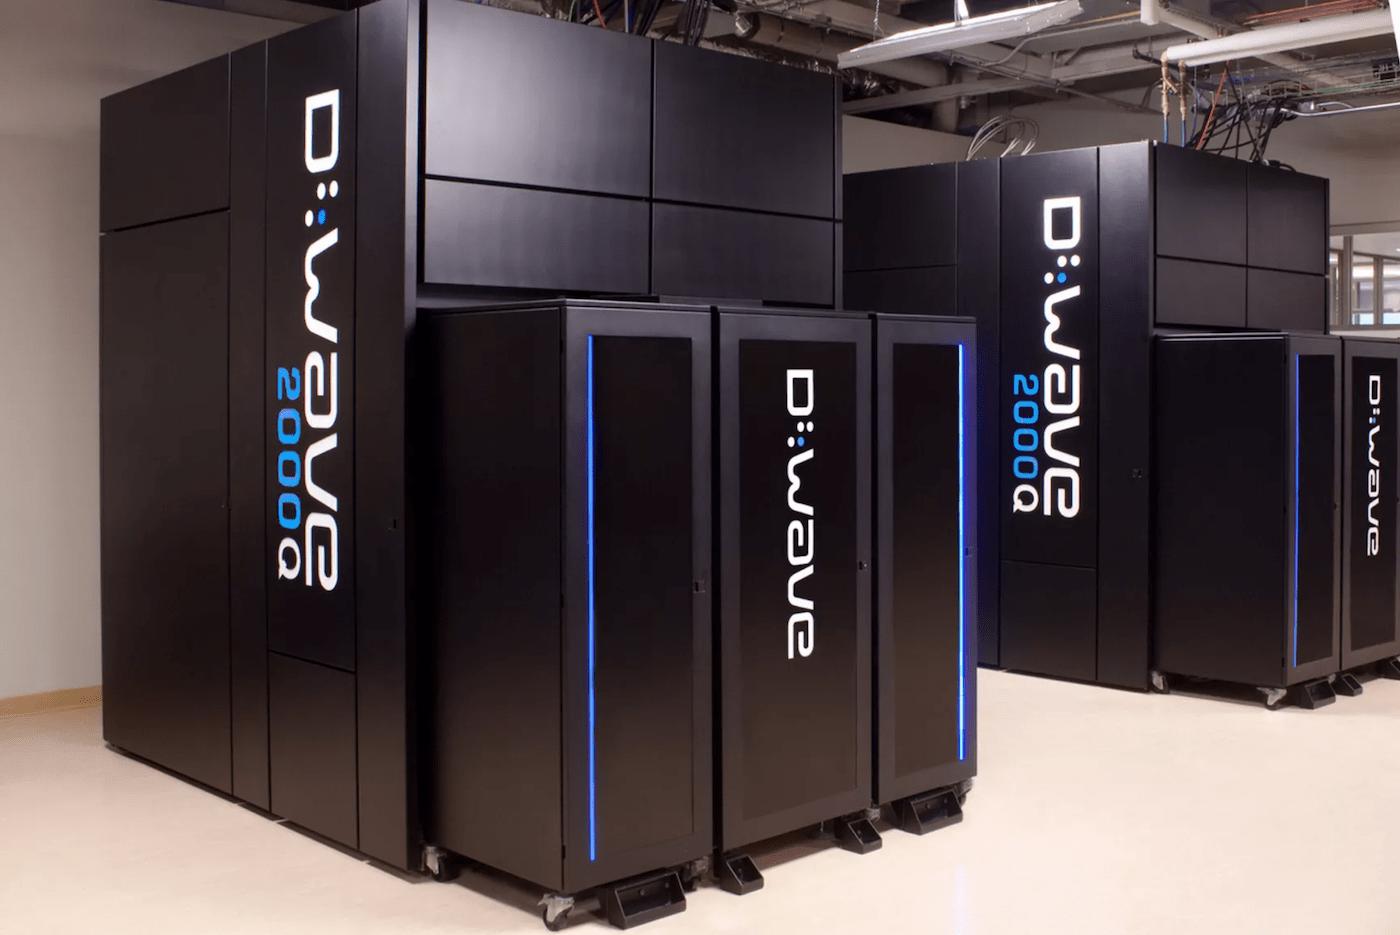 D wave has its first customer for a 15 million quantum computer undo solutioingenieria Choice Image